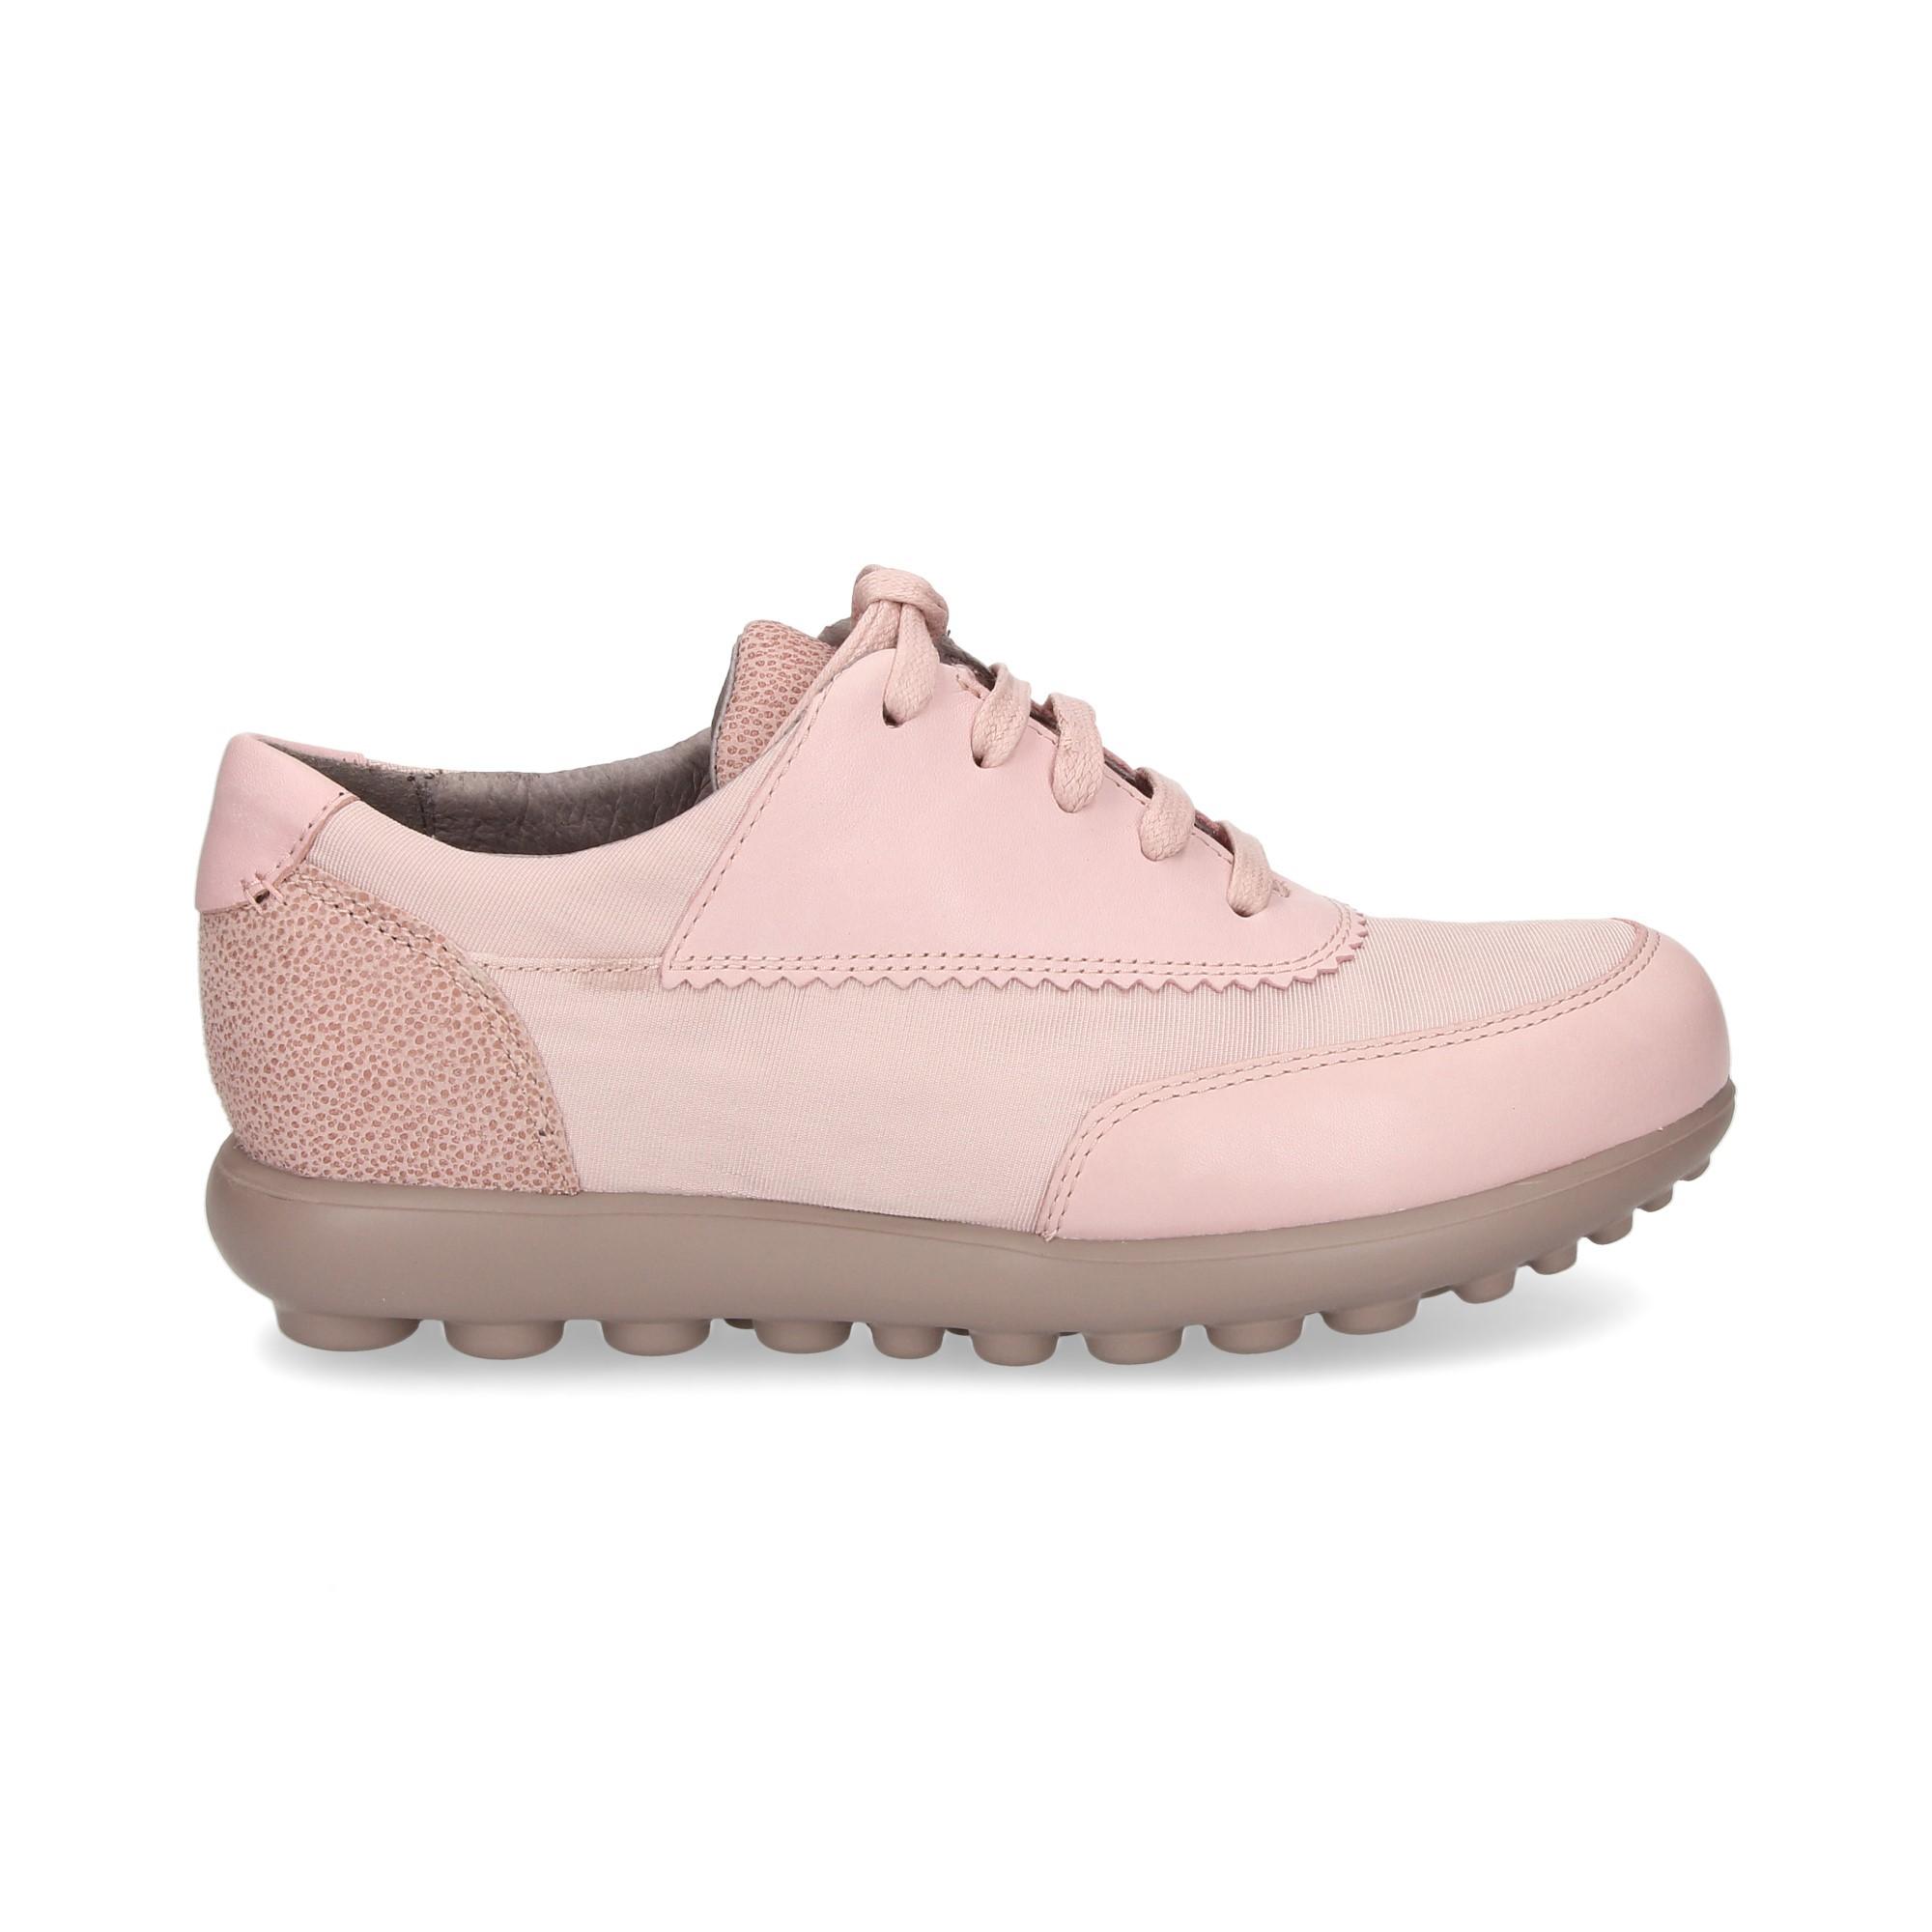 deportivo-acordonado-textil-piel-rosa